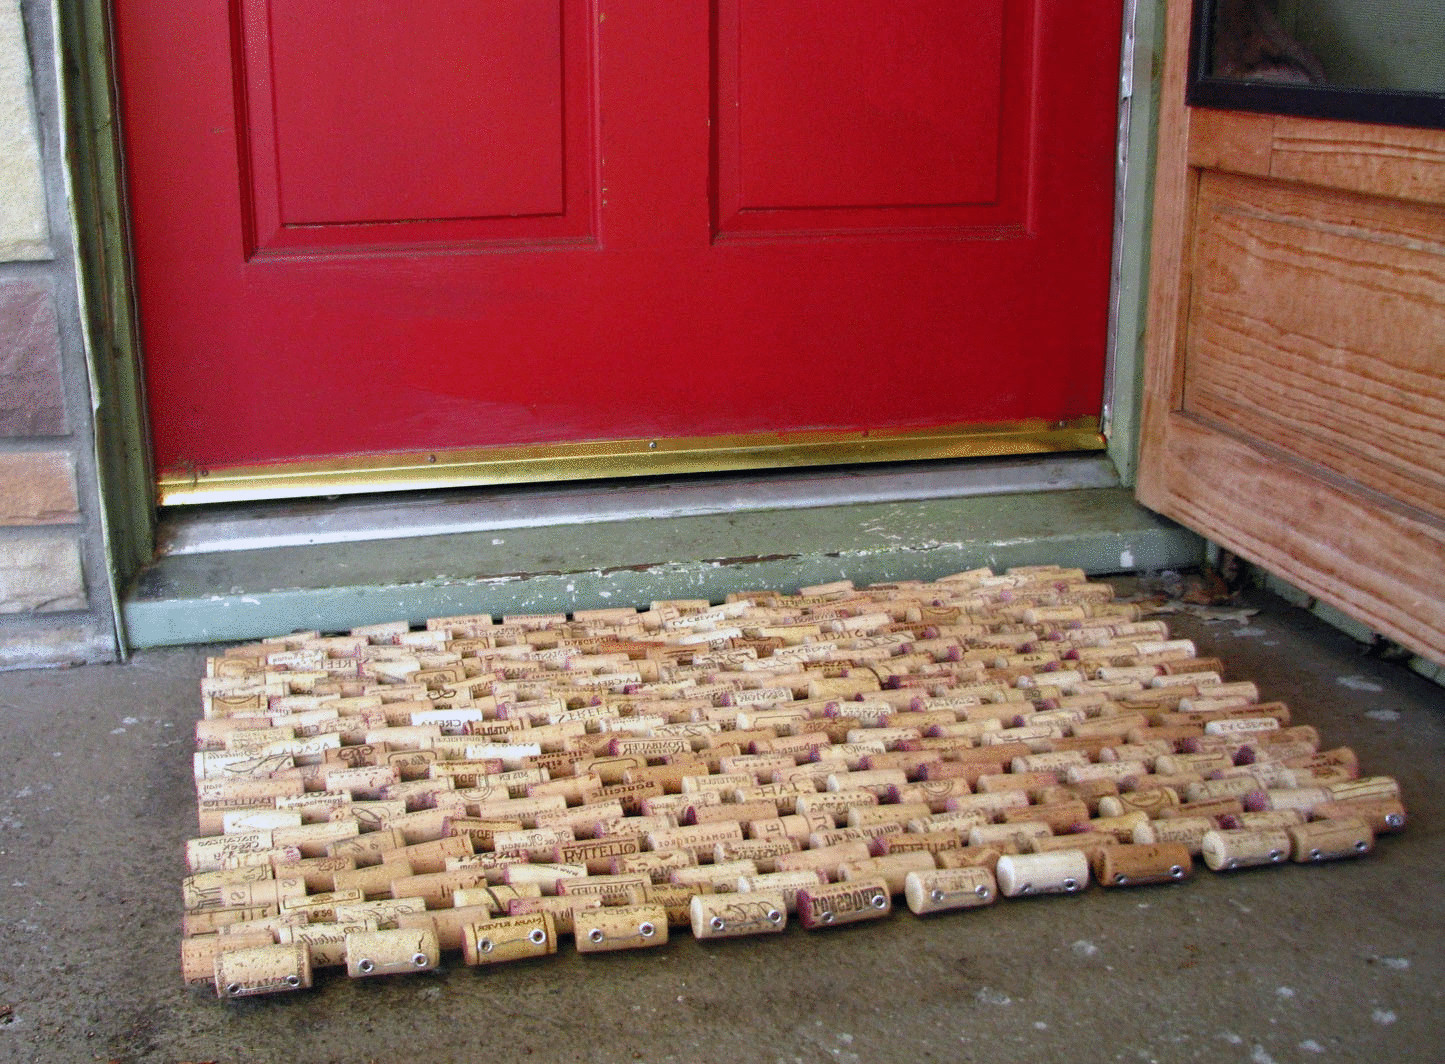 коврик из пробок на улице